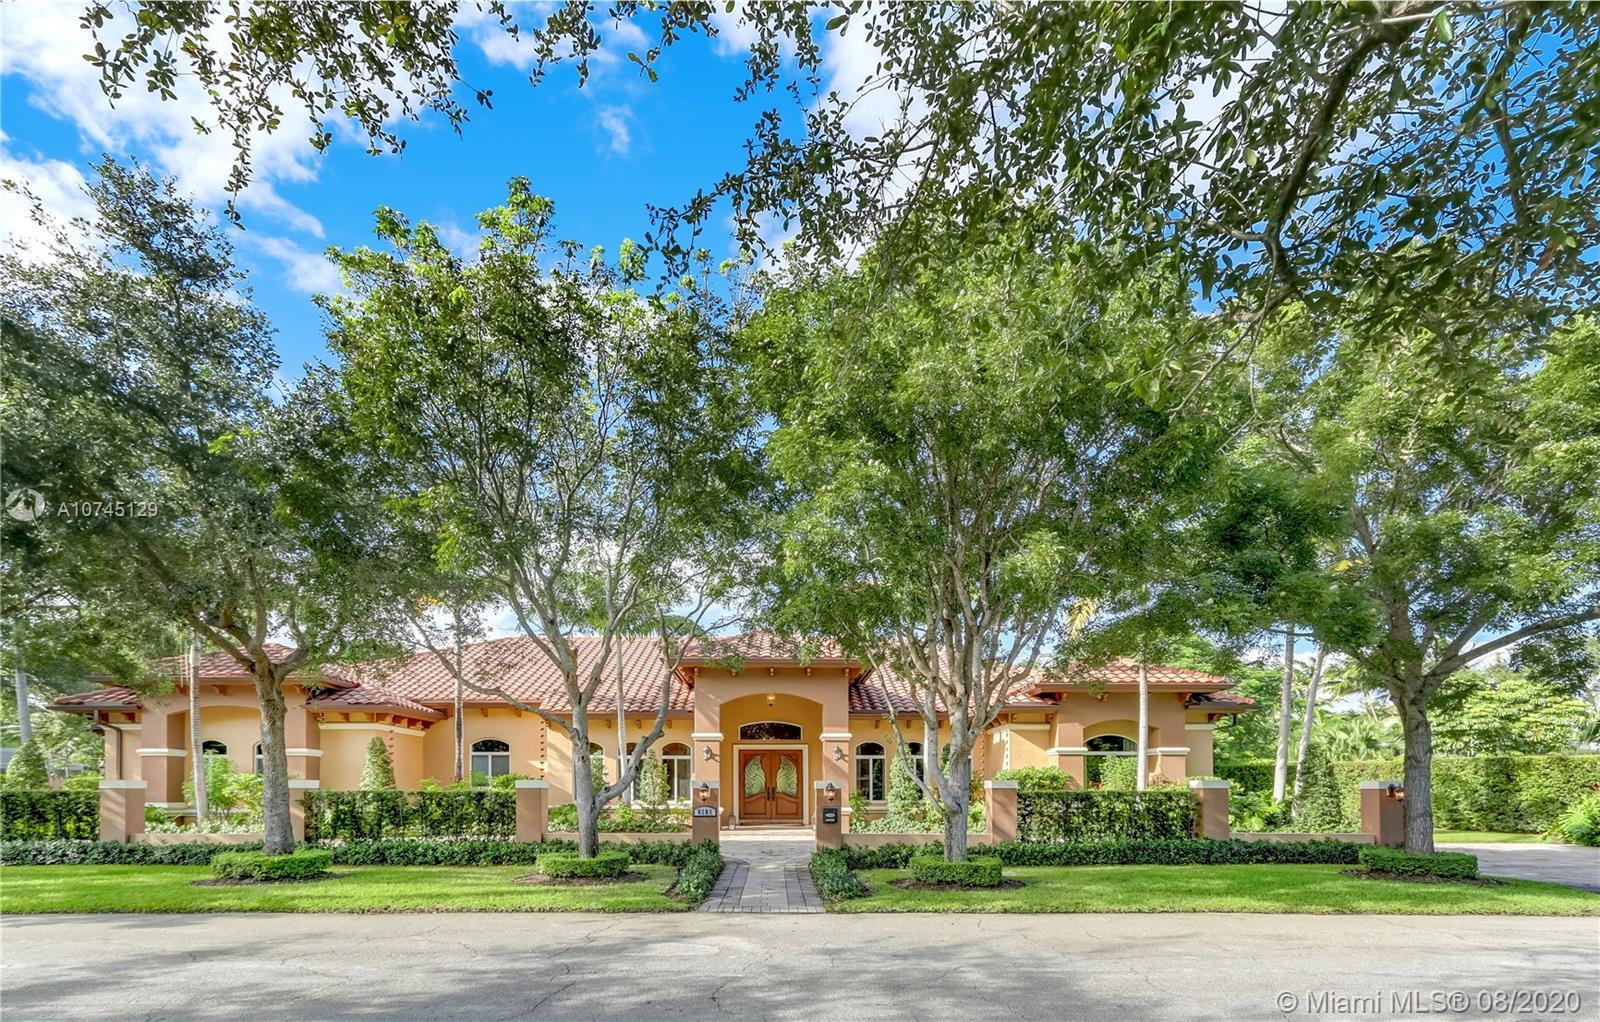 Pine Tree Estates - 8101 SW 133rd St, Pinecrest, FL 33156